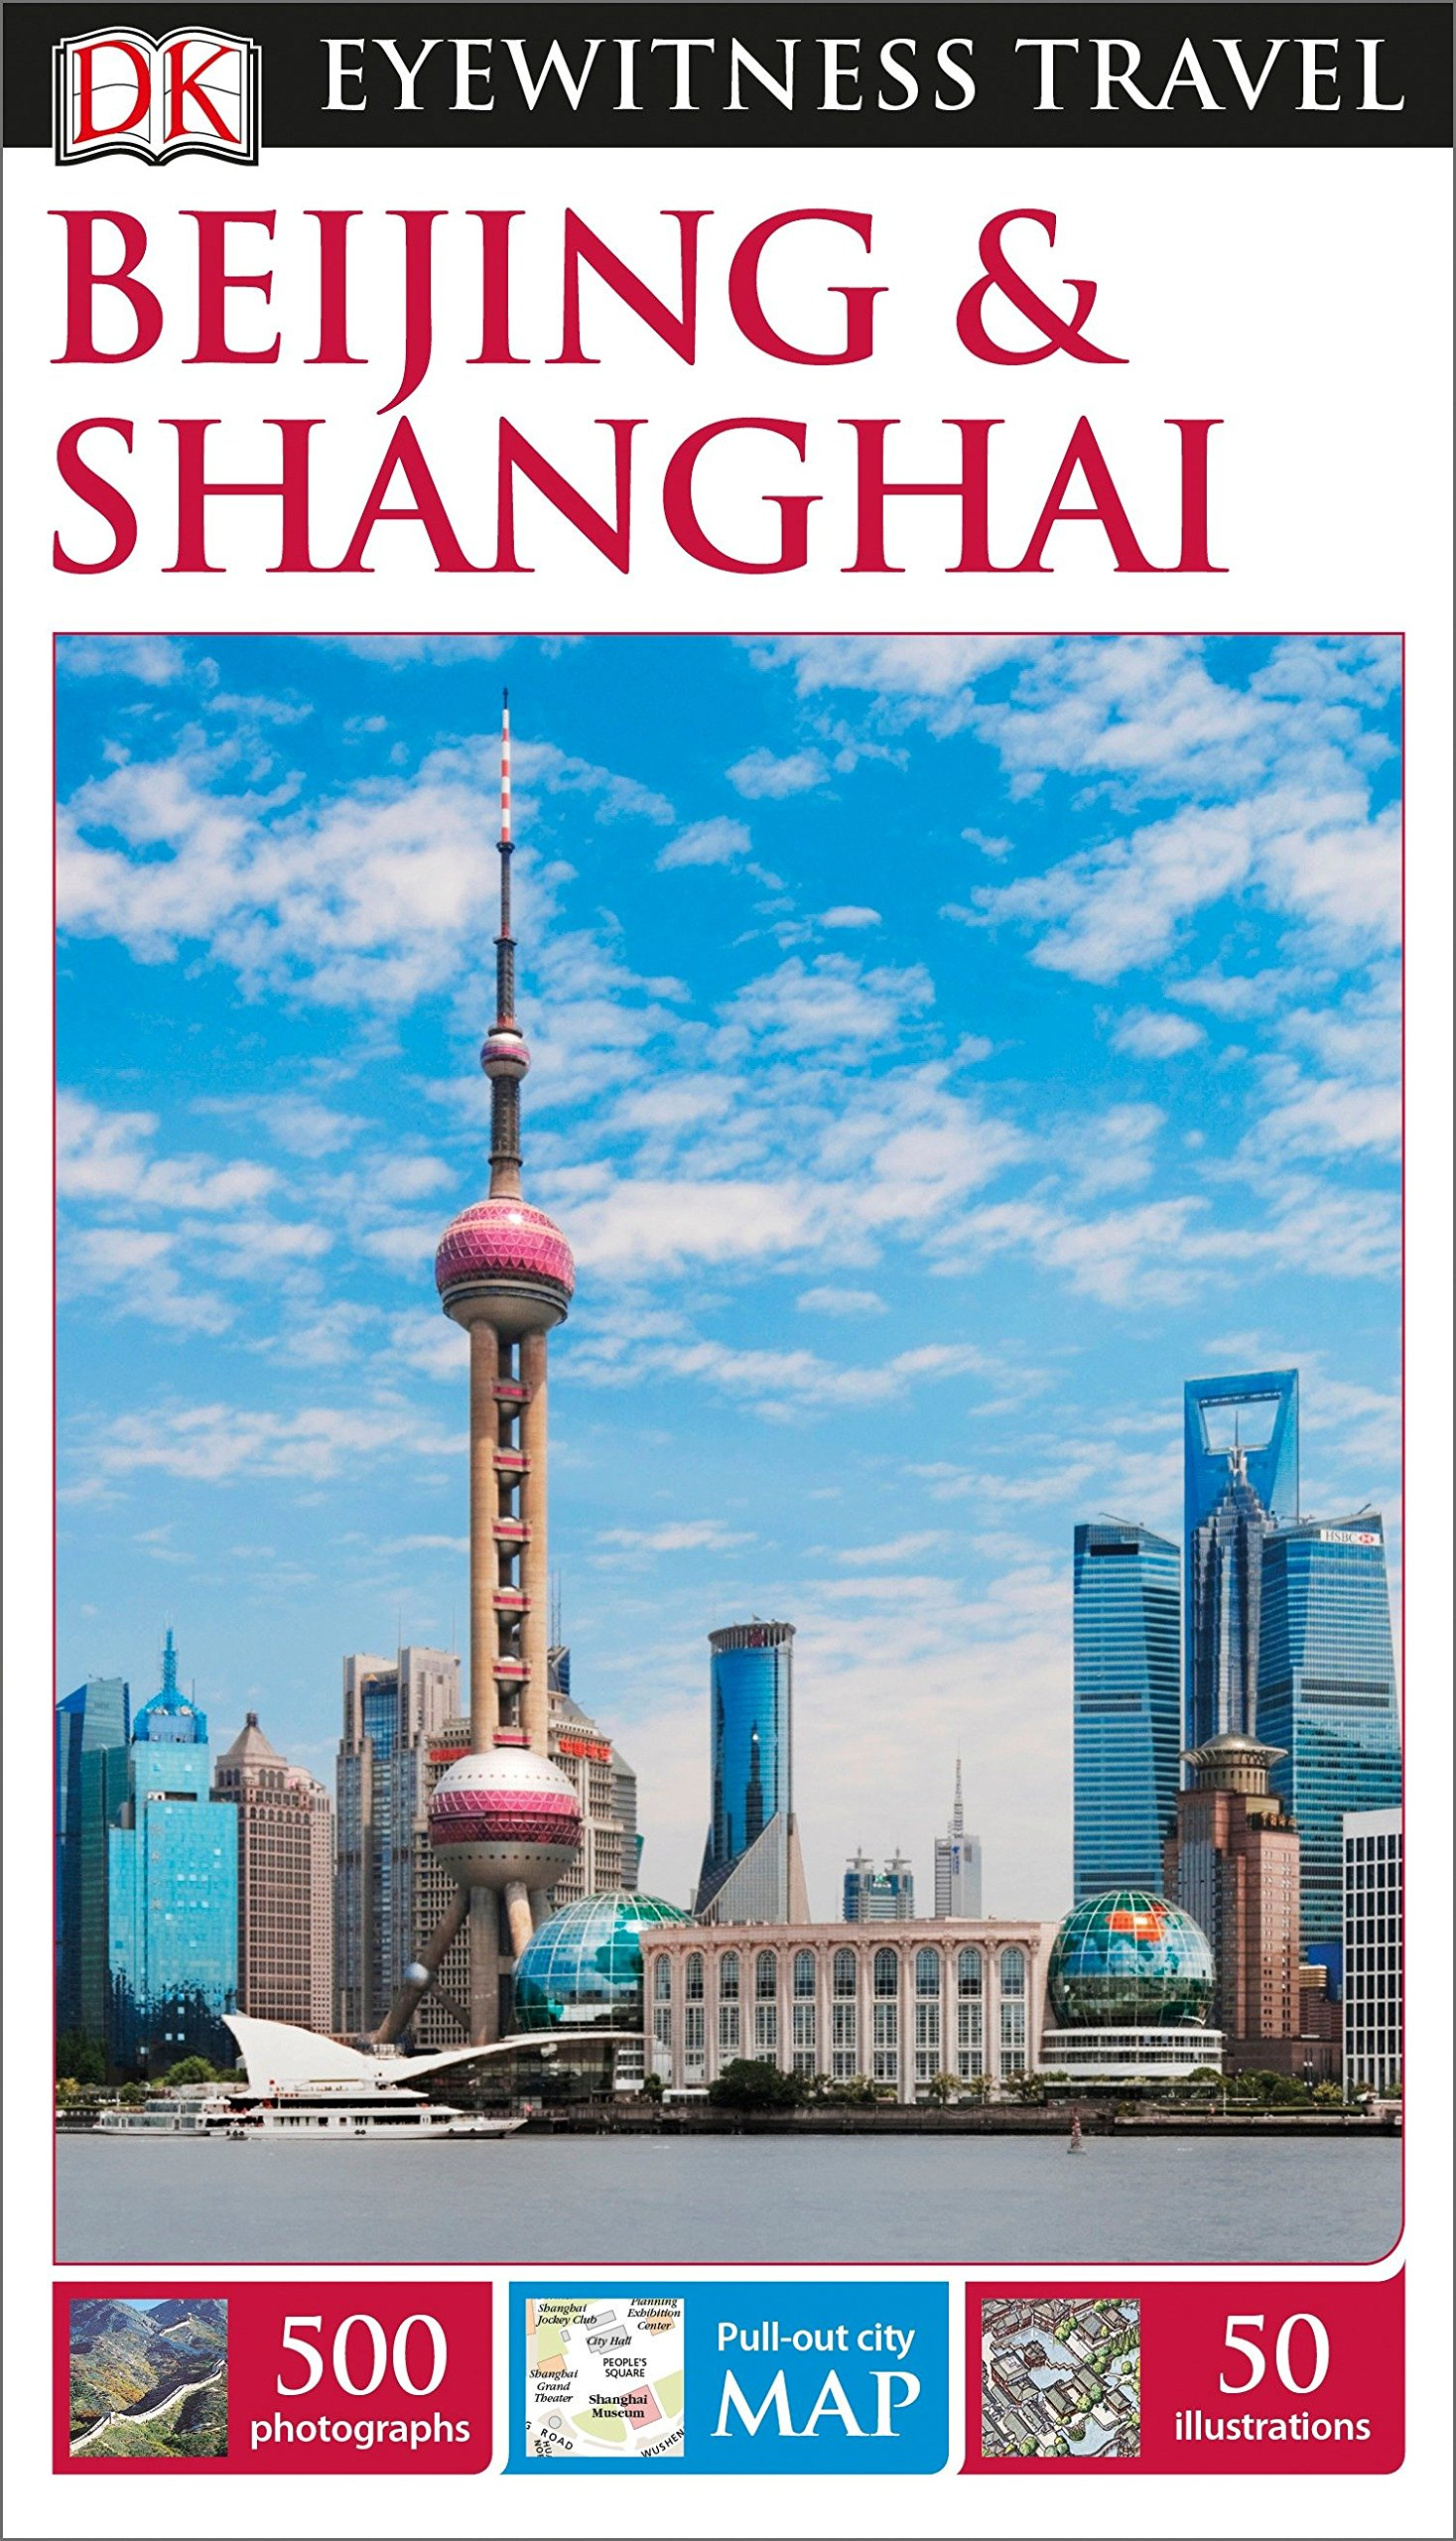 DK Eyewitness Travel Guide Beijing and Shanghai by Dorling Kindersley Publishing Staff